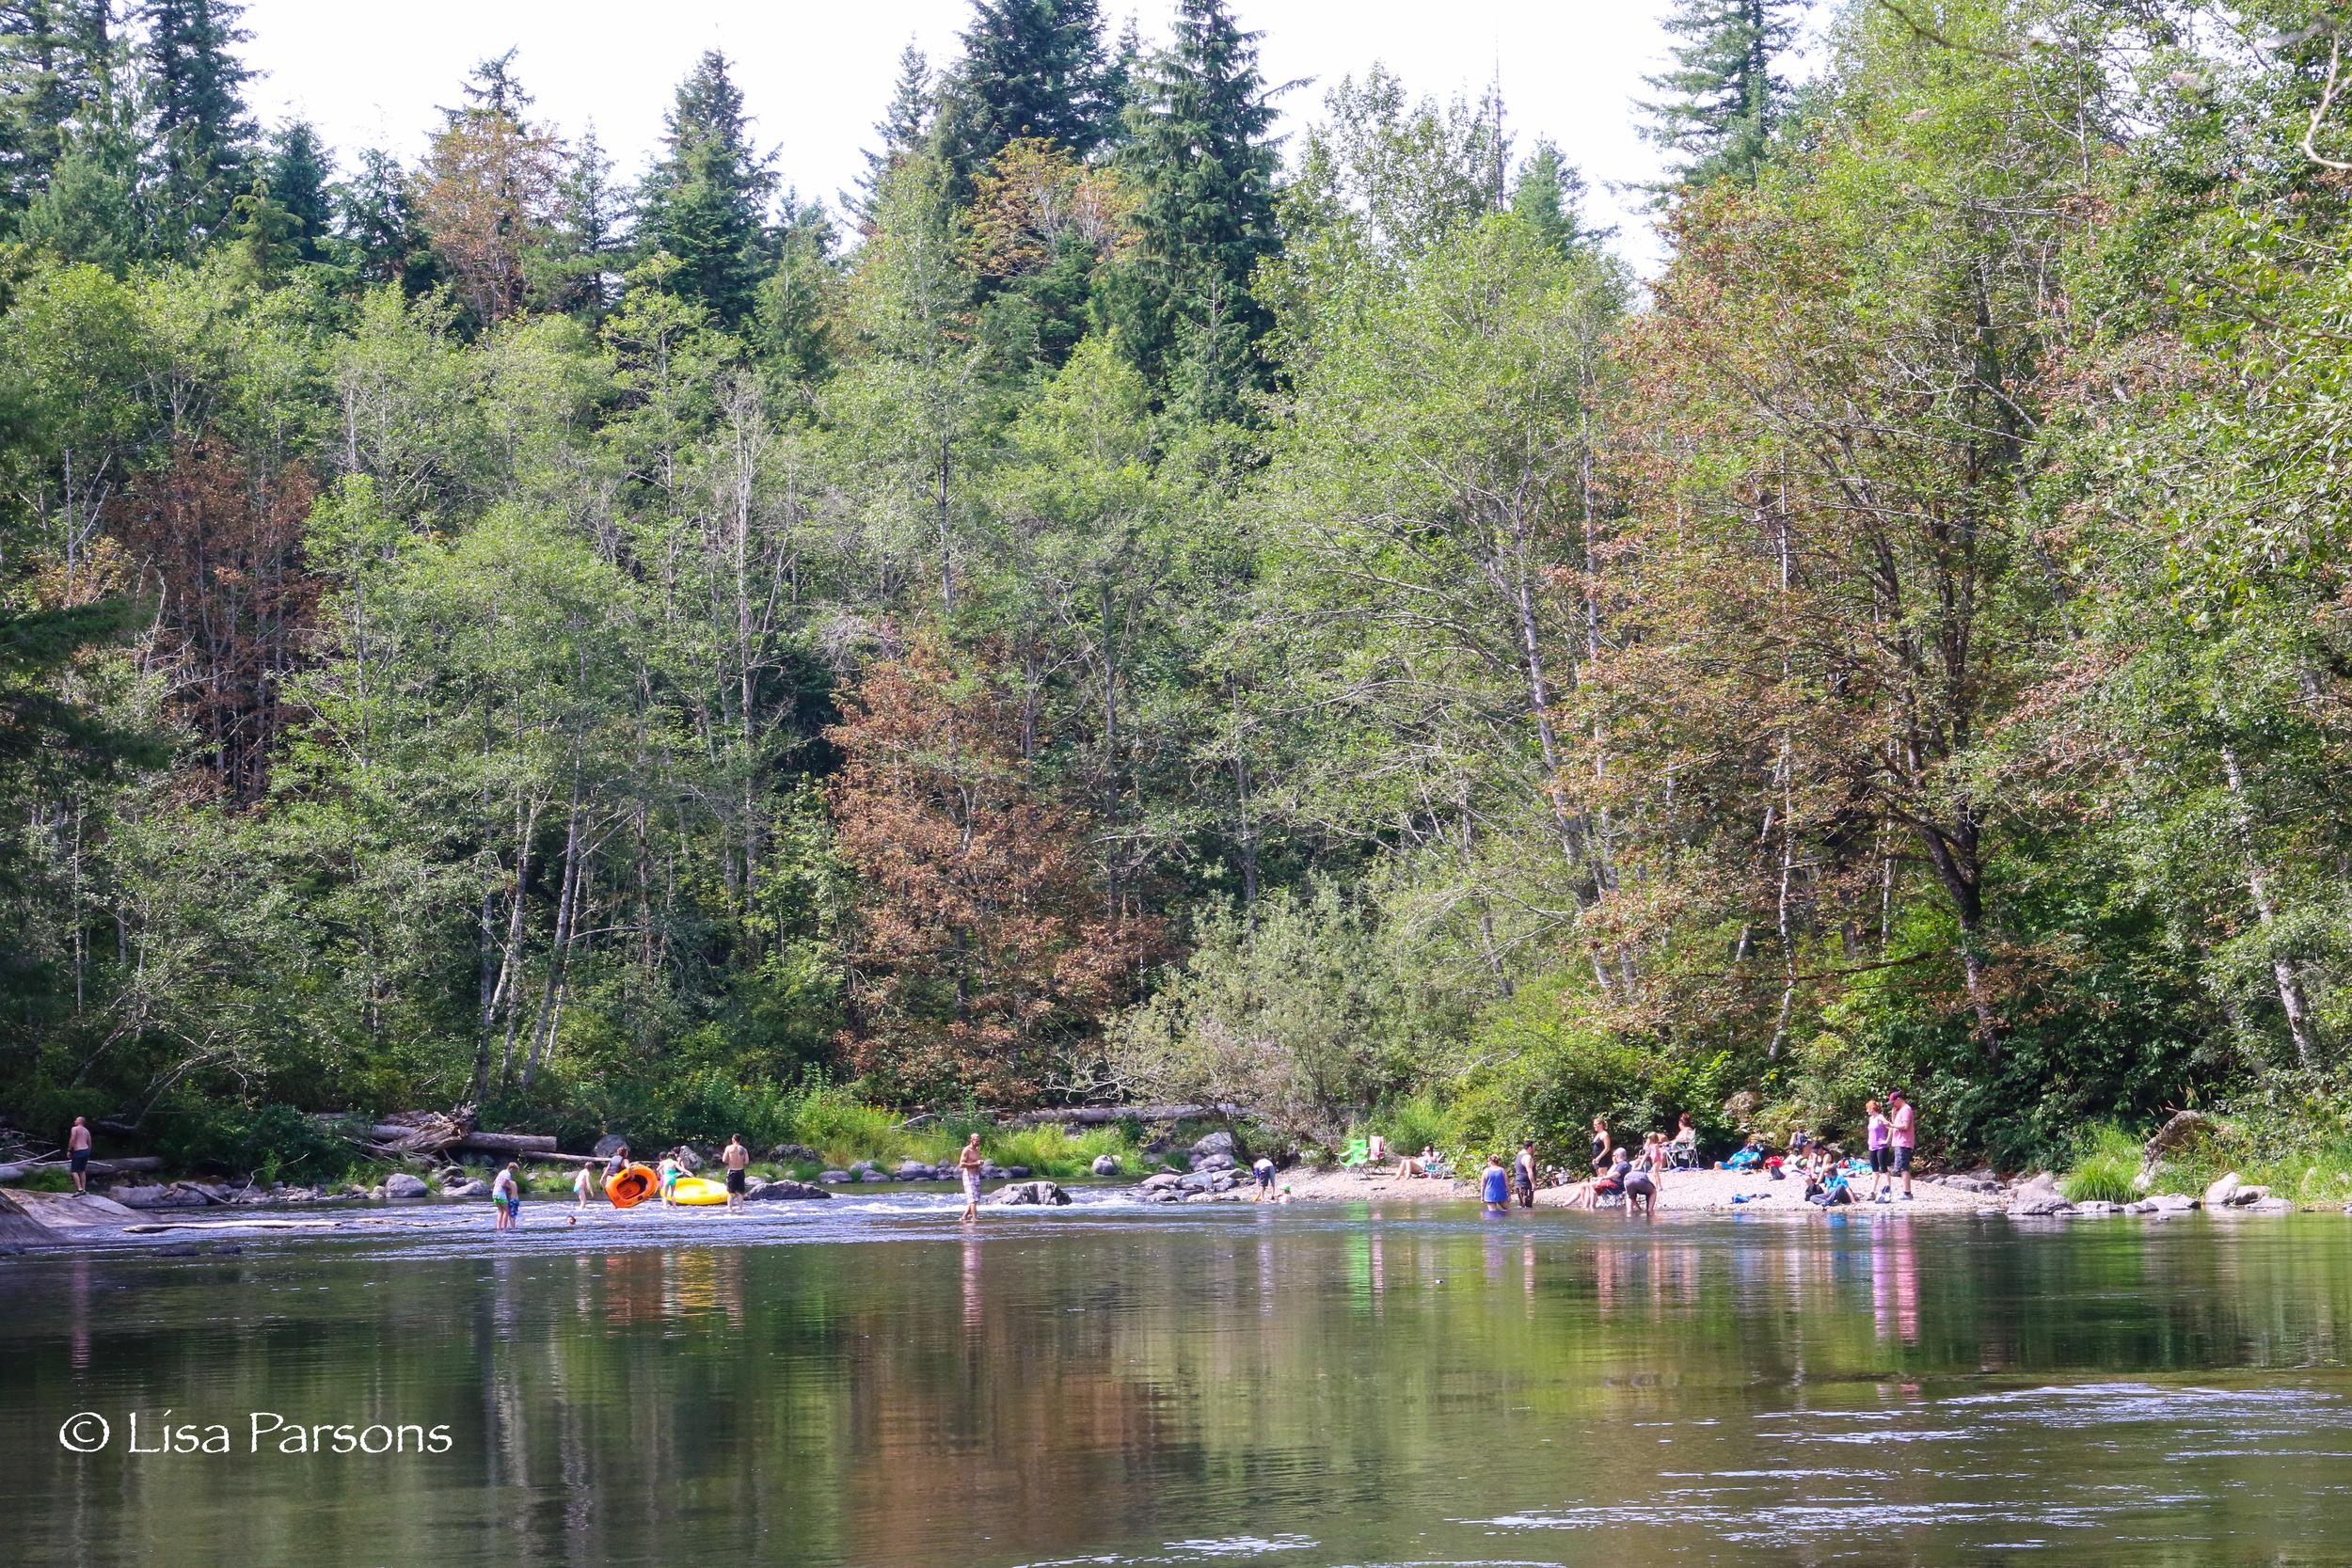 Families Enjoying the River